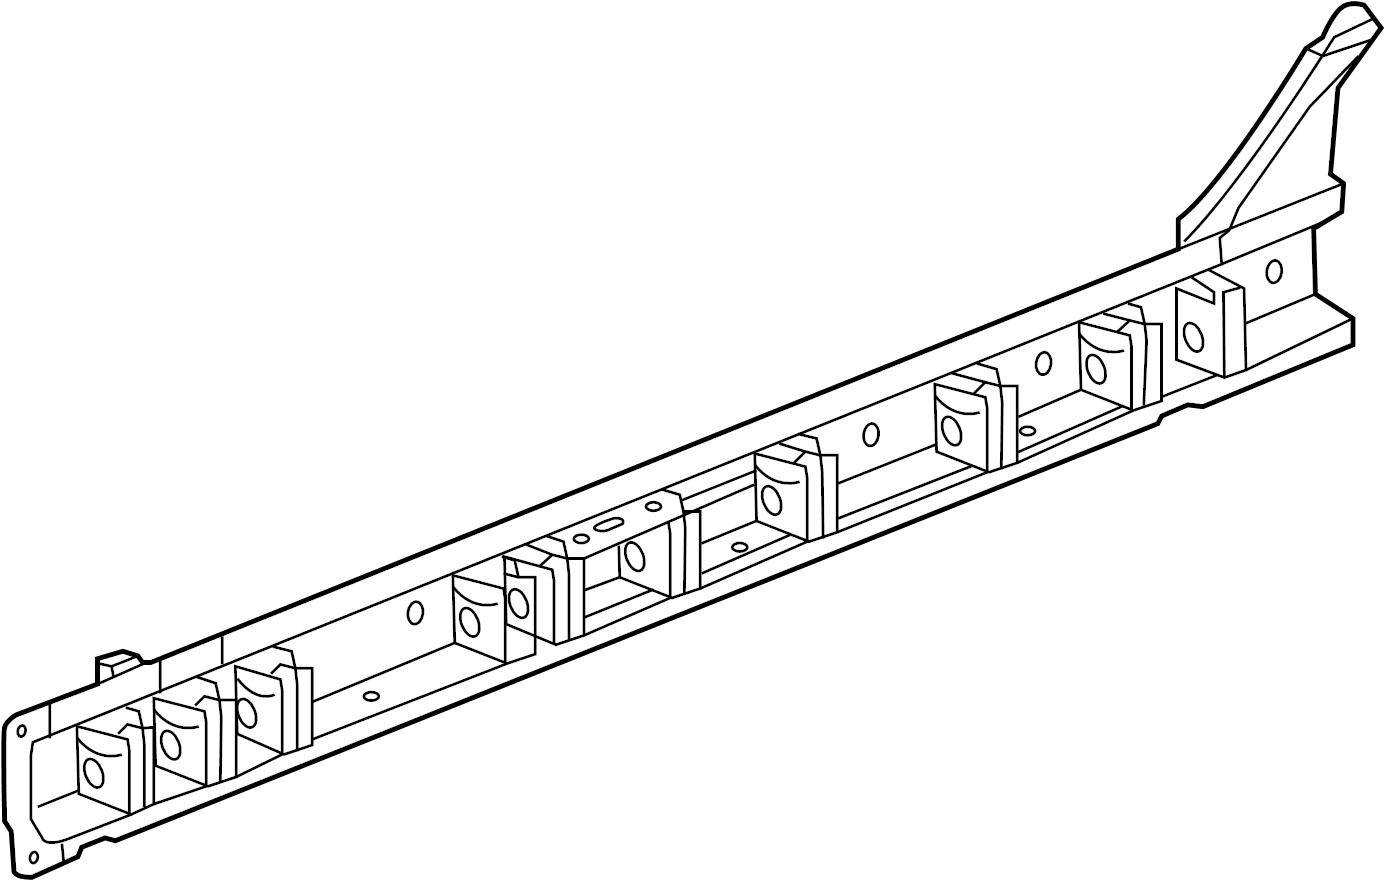 Chevrolet Malibu Reinforced Panel Rocker Floor Extension Front Inner Reinforcement